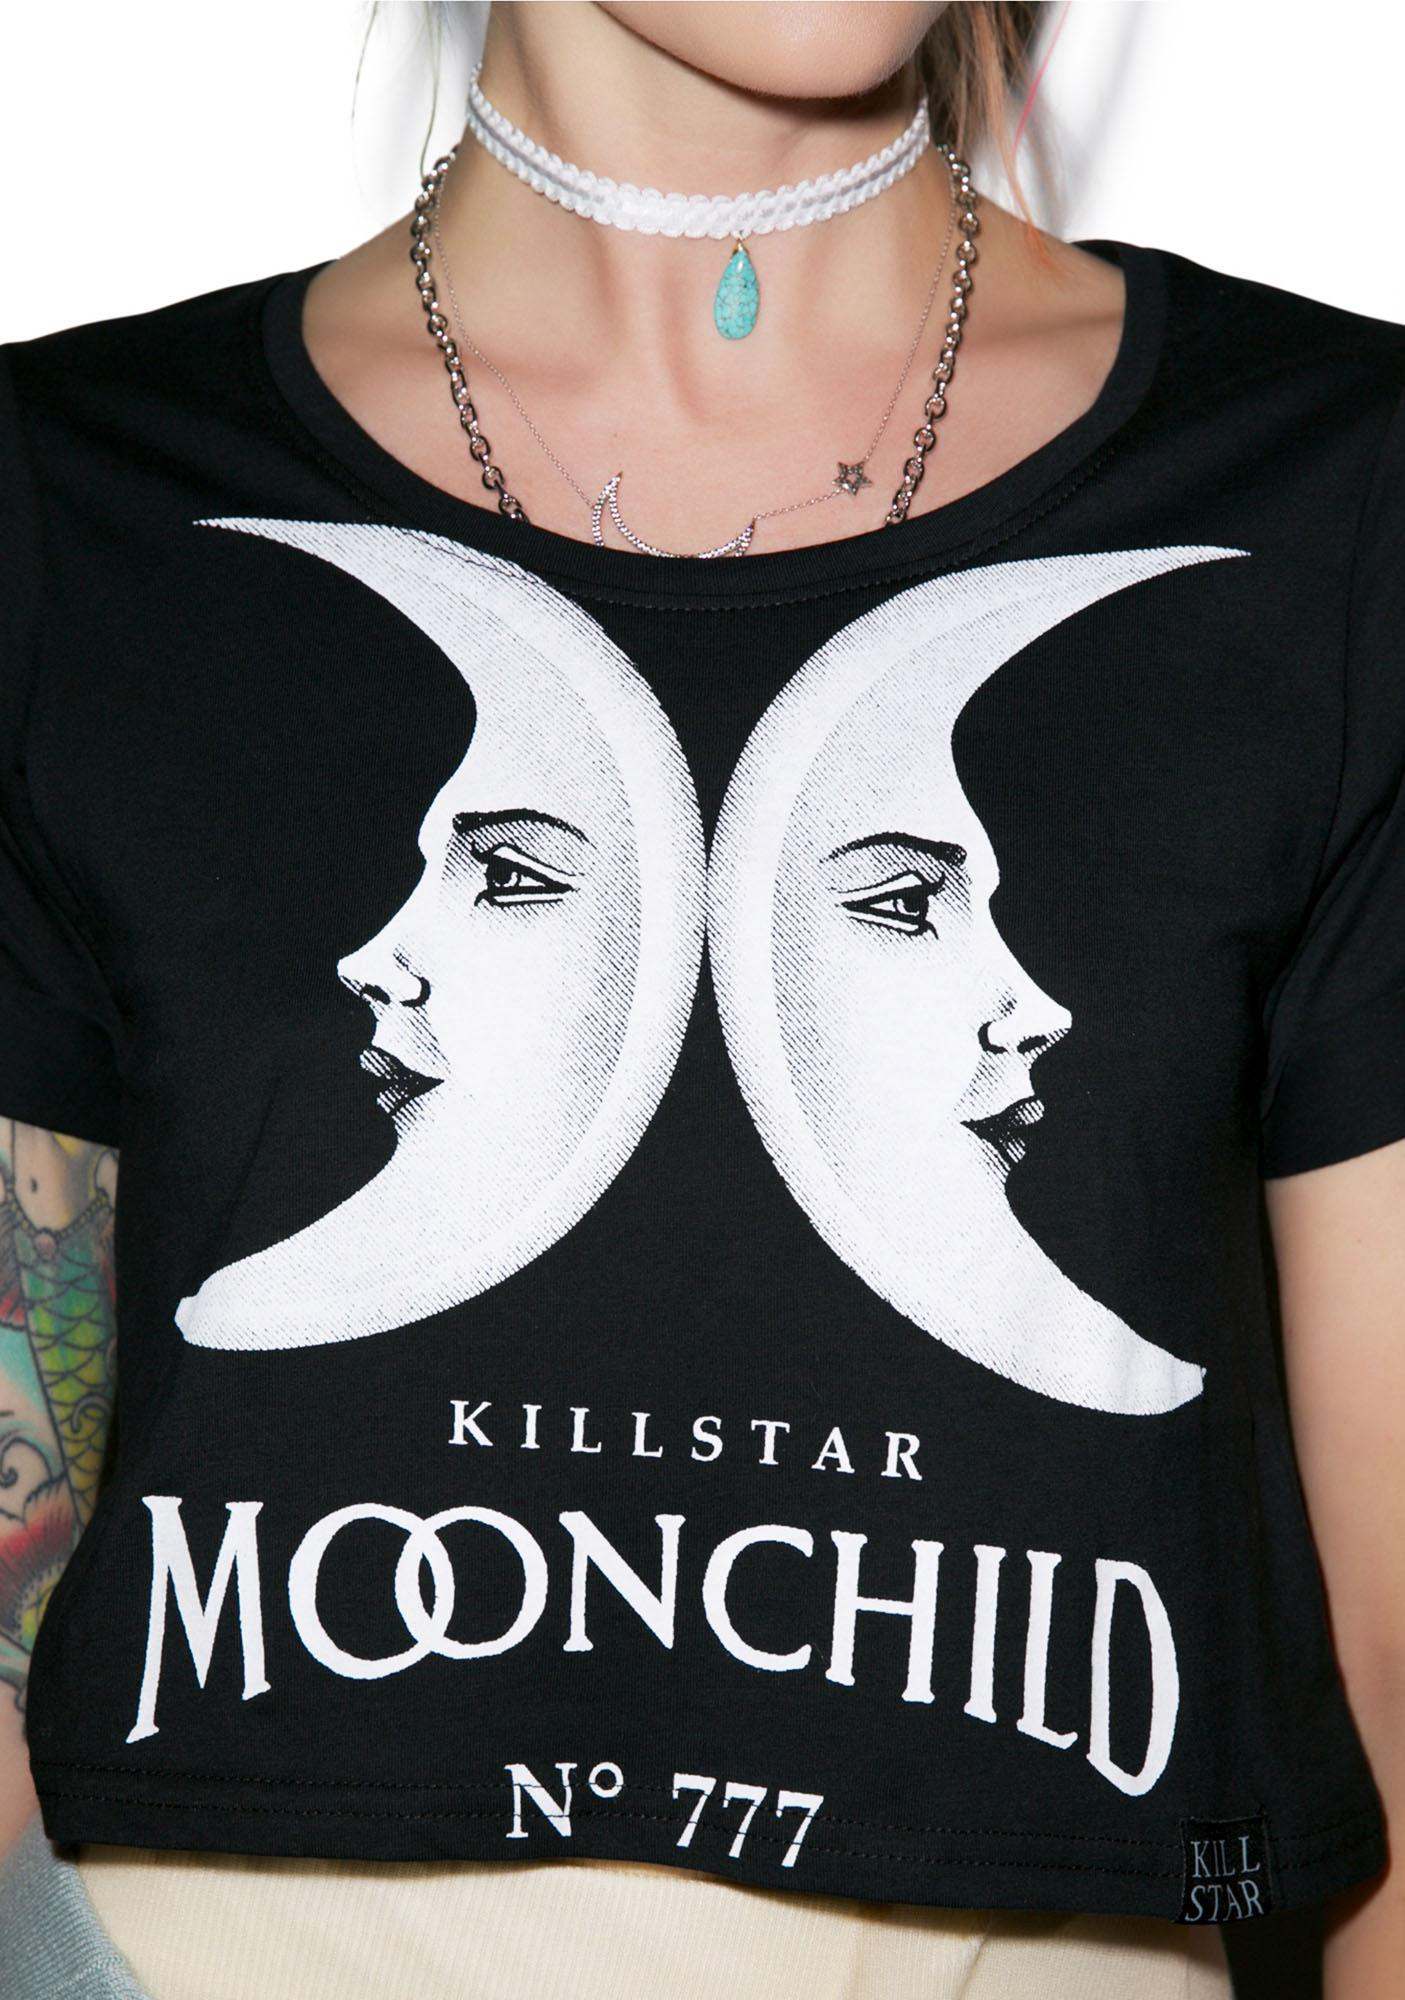 Killstar Moon Child Crop Top